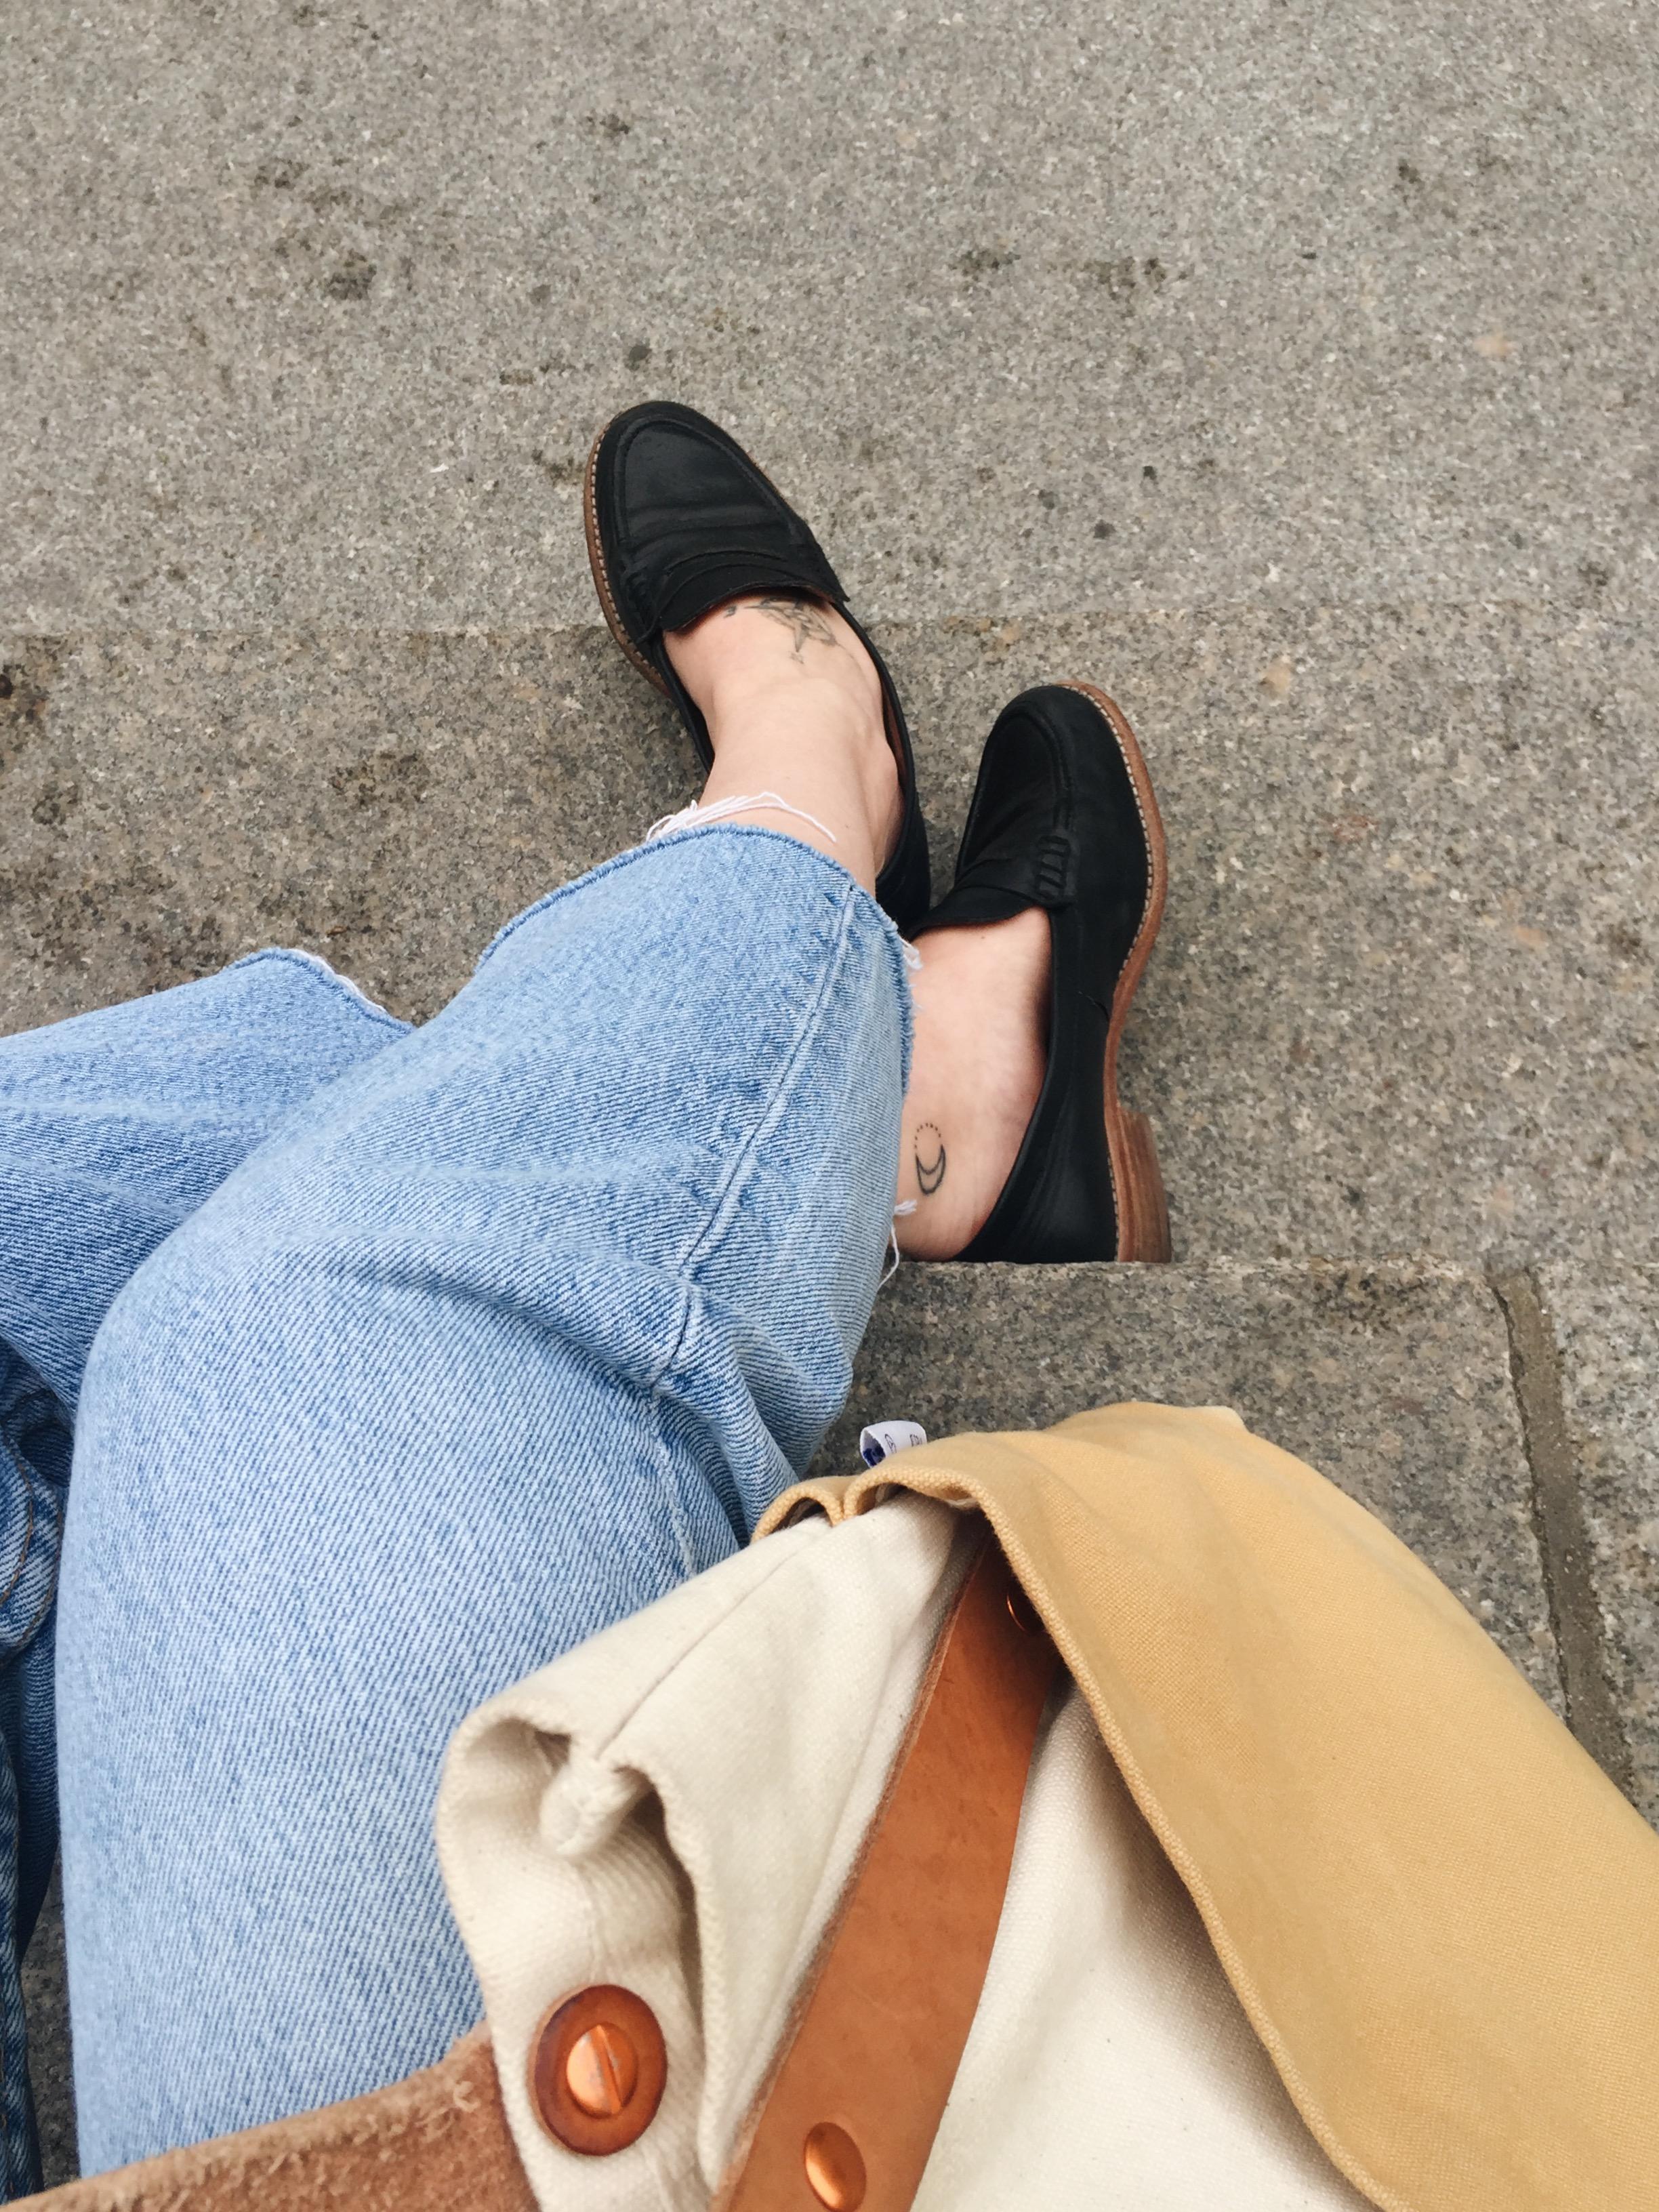 Me sitting on The Met steps feeling like a Gossip Girl character